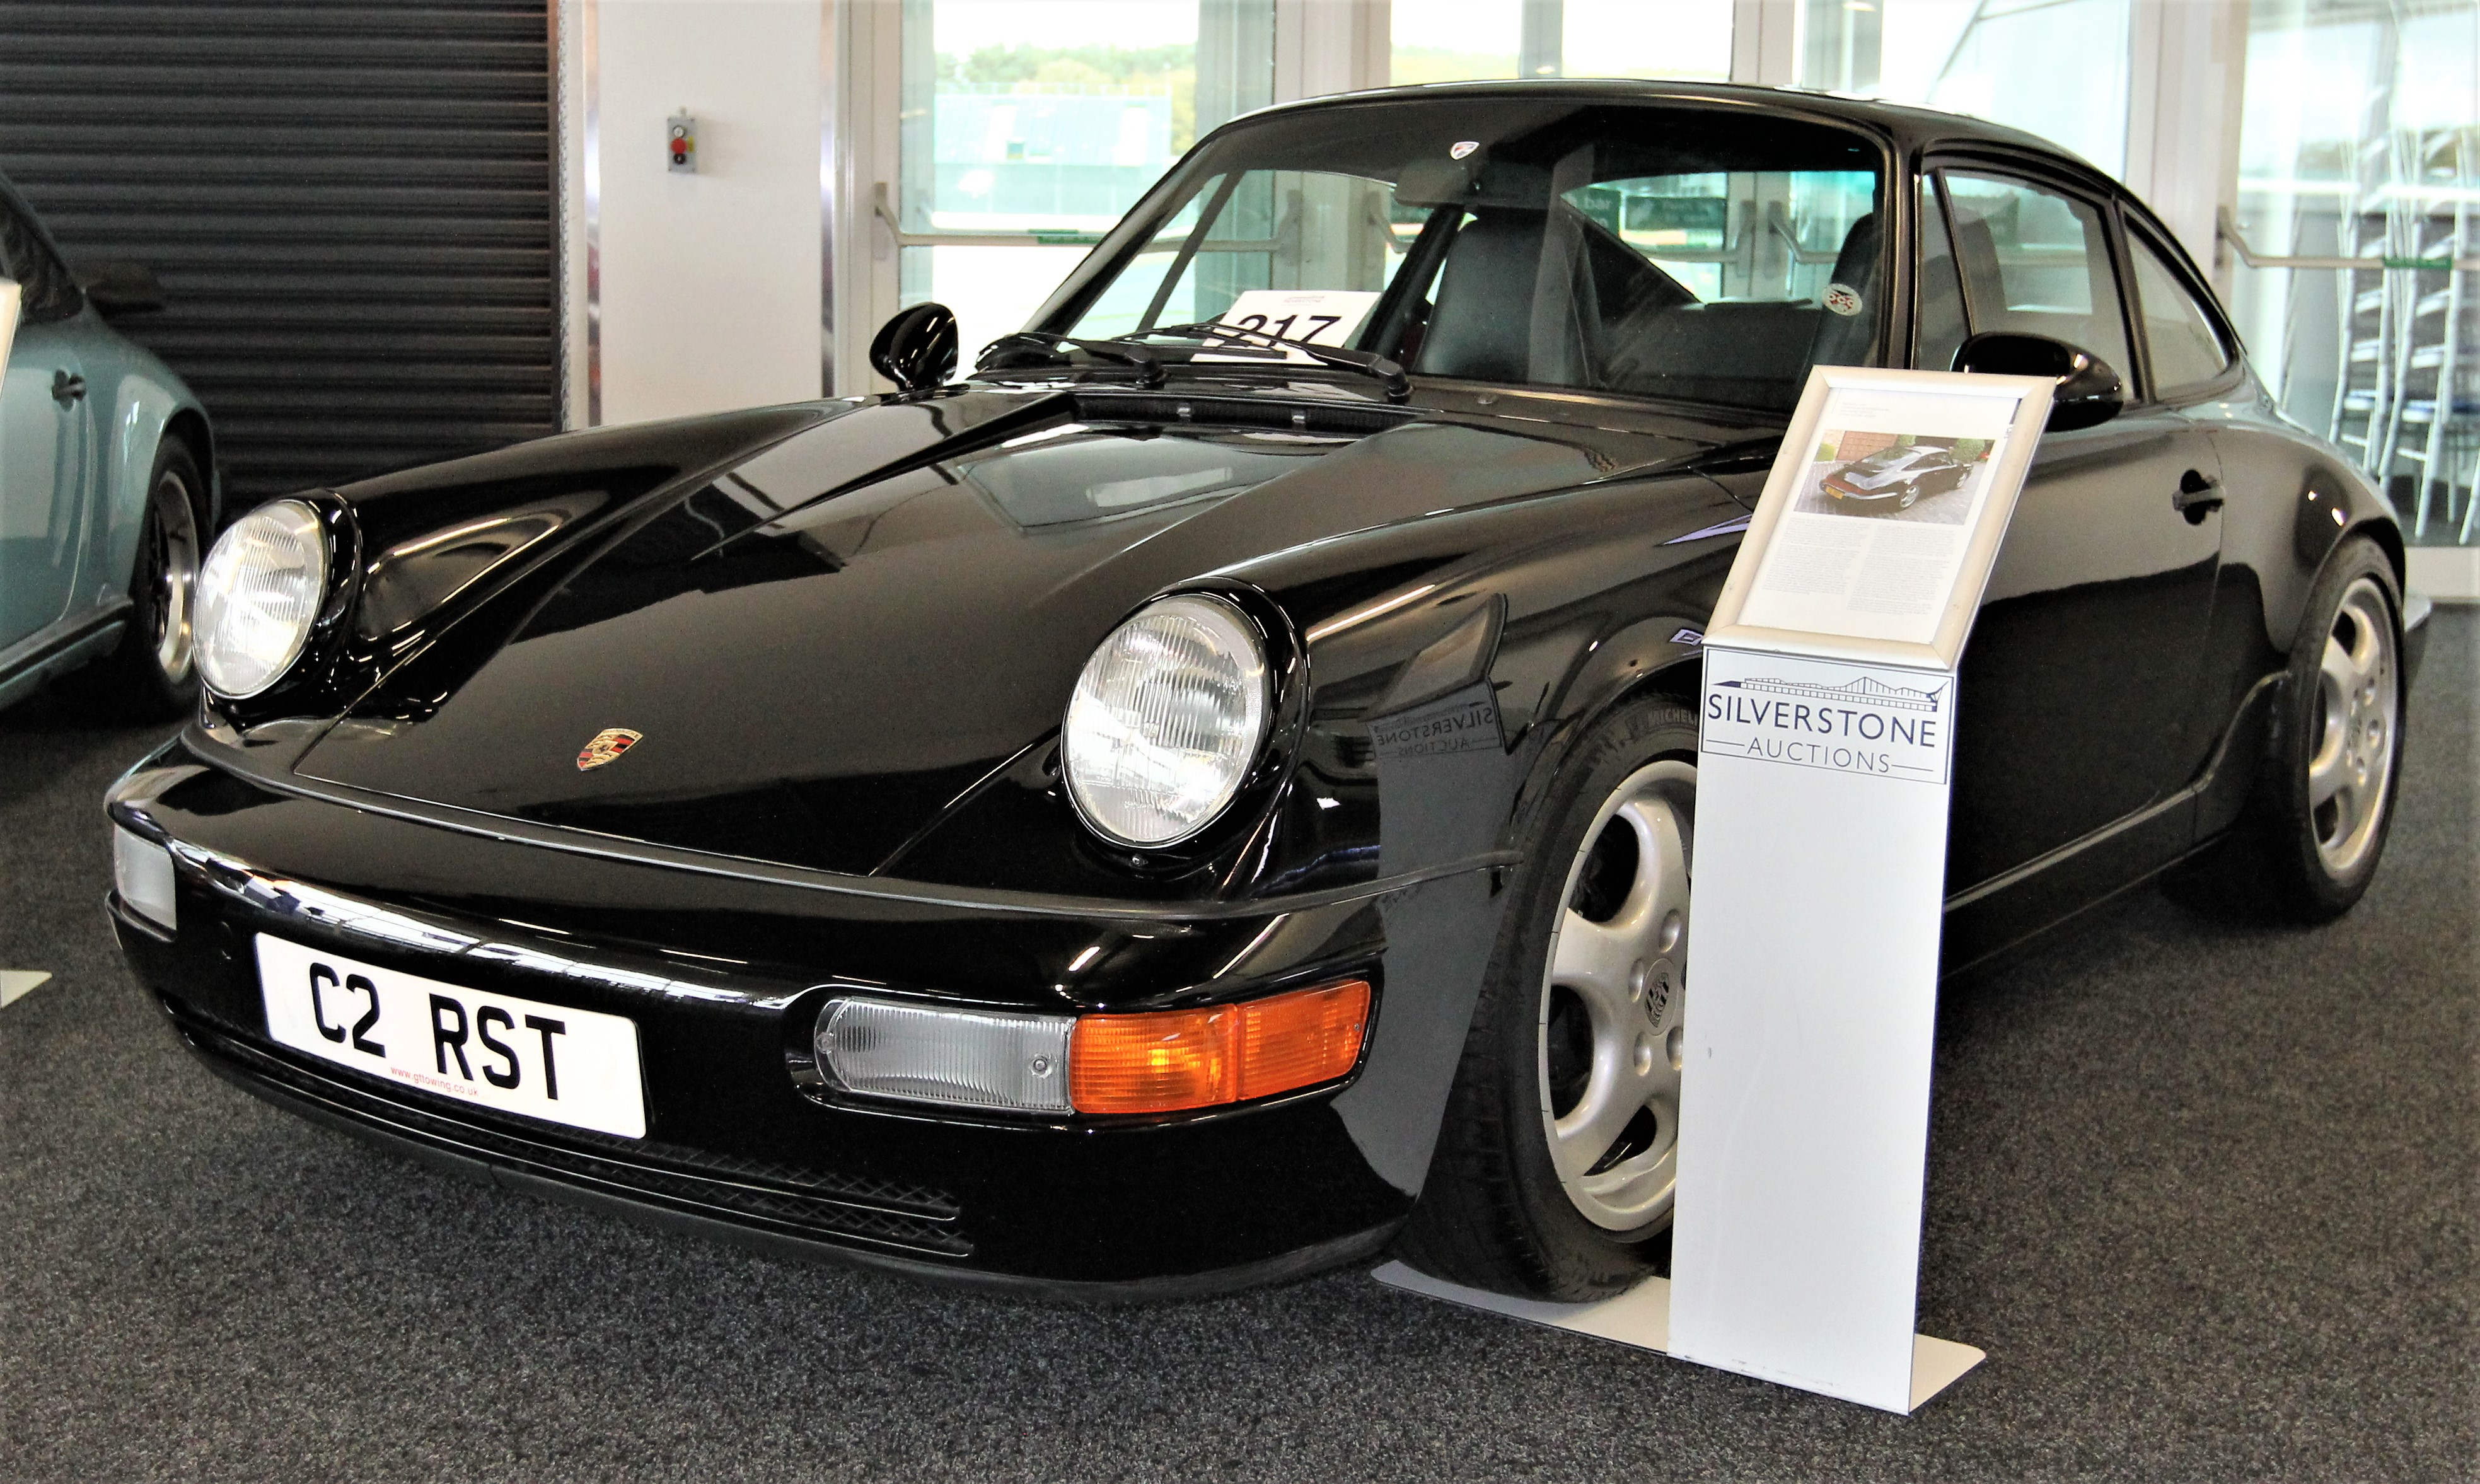 , Porsche sale in the UK hits $3.28 million, ClassicCars.com Journal